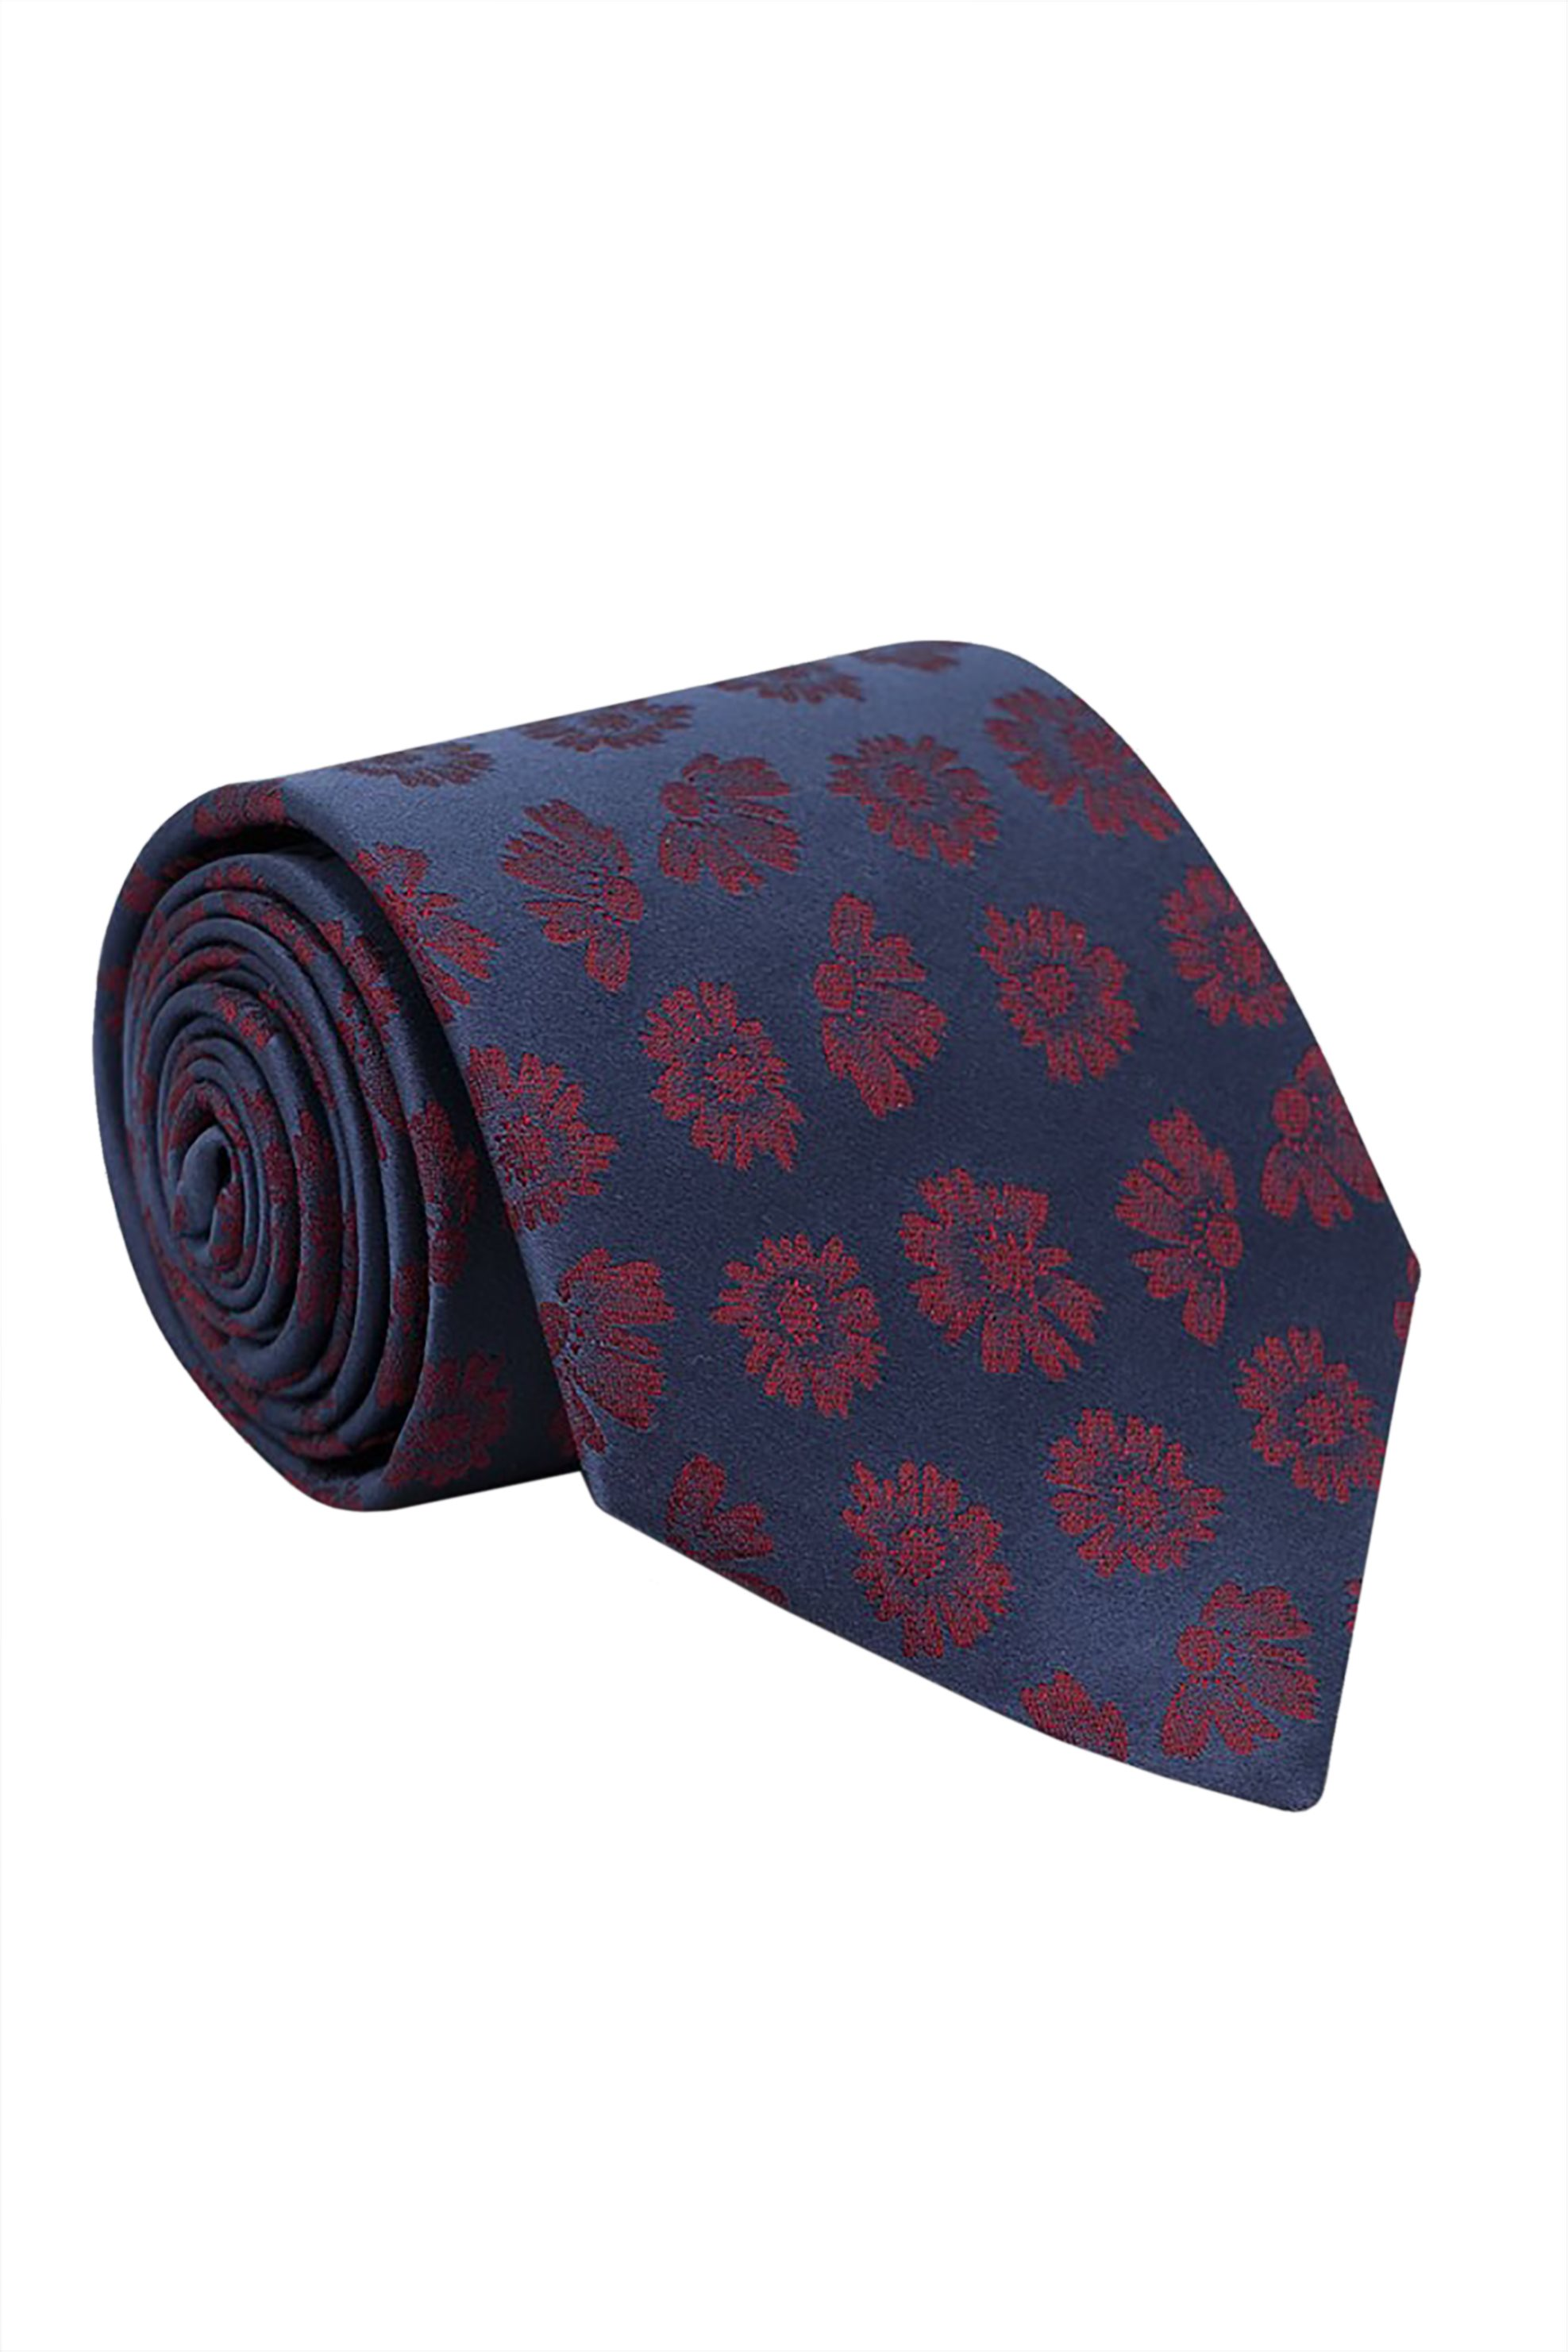 Oxford Company ανδρική μεταξωτή γραβάτα με floral print - TIE51-413.02 - Μπλε Σκούρο